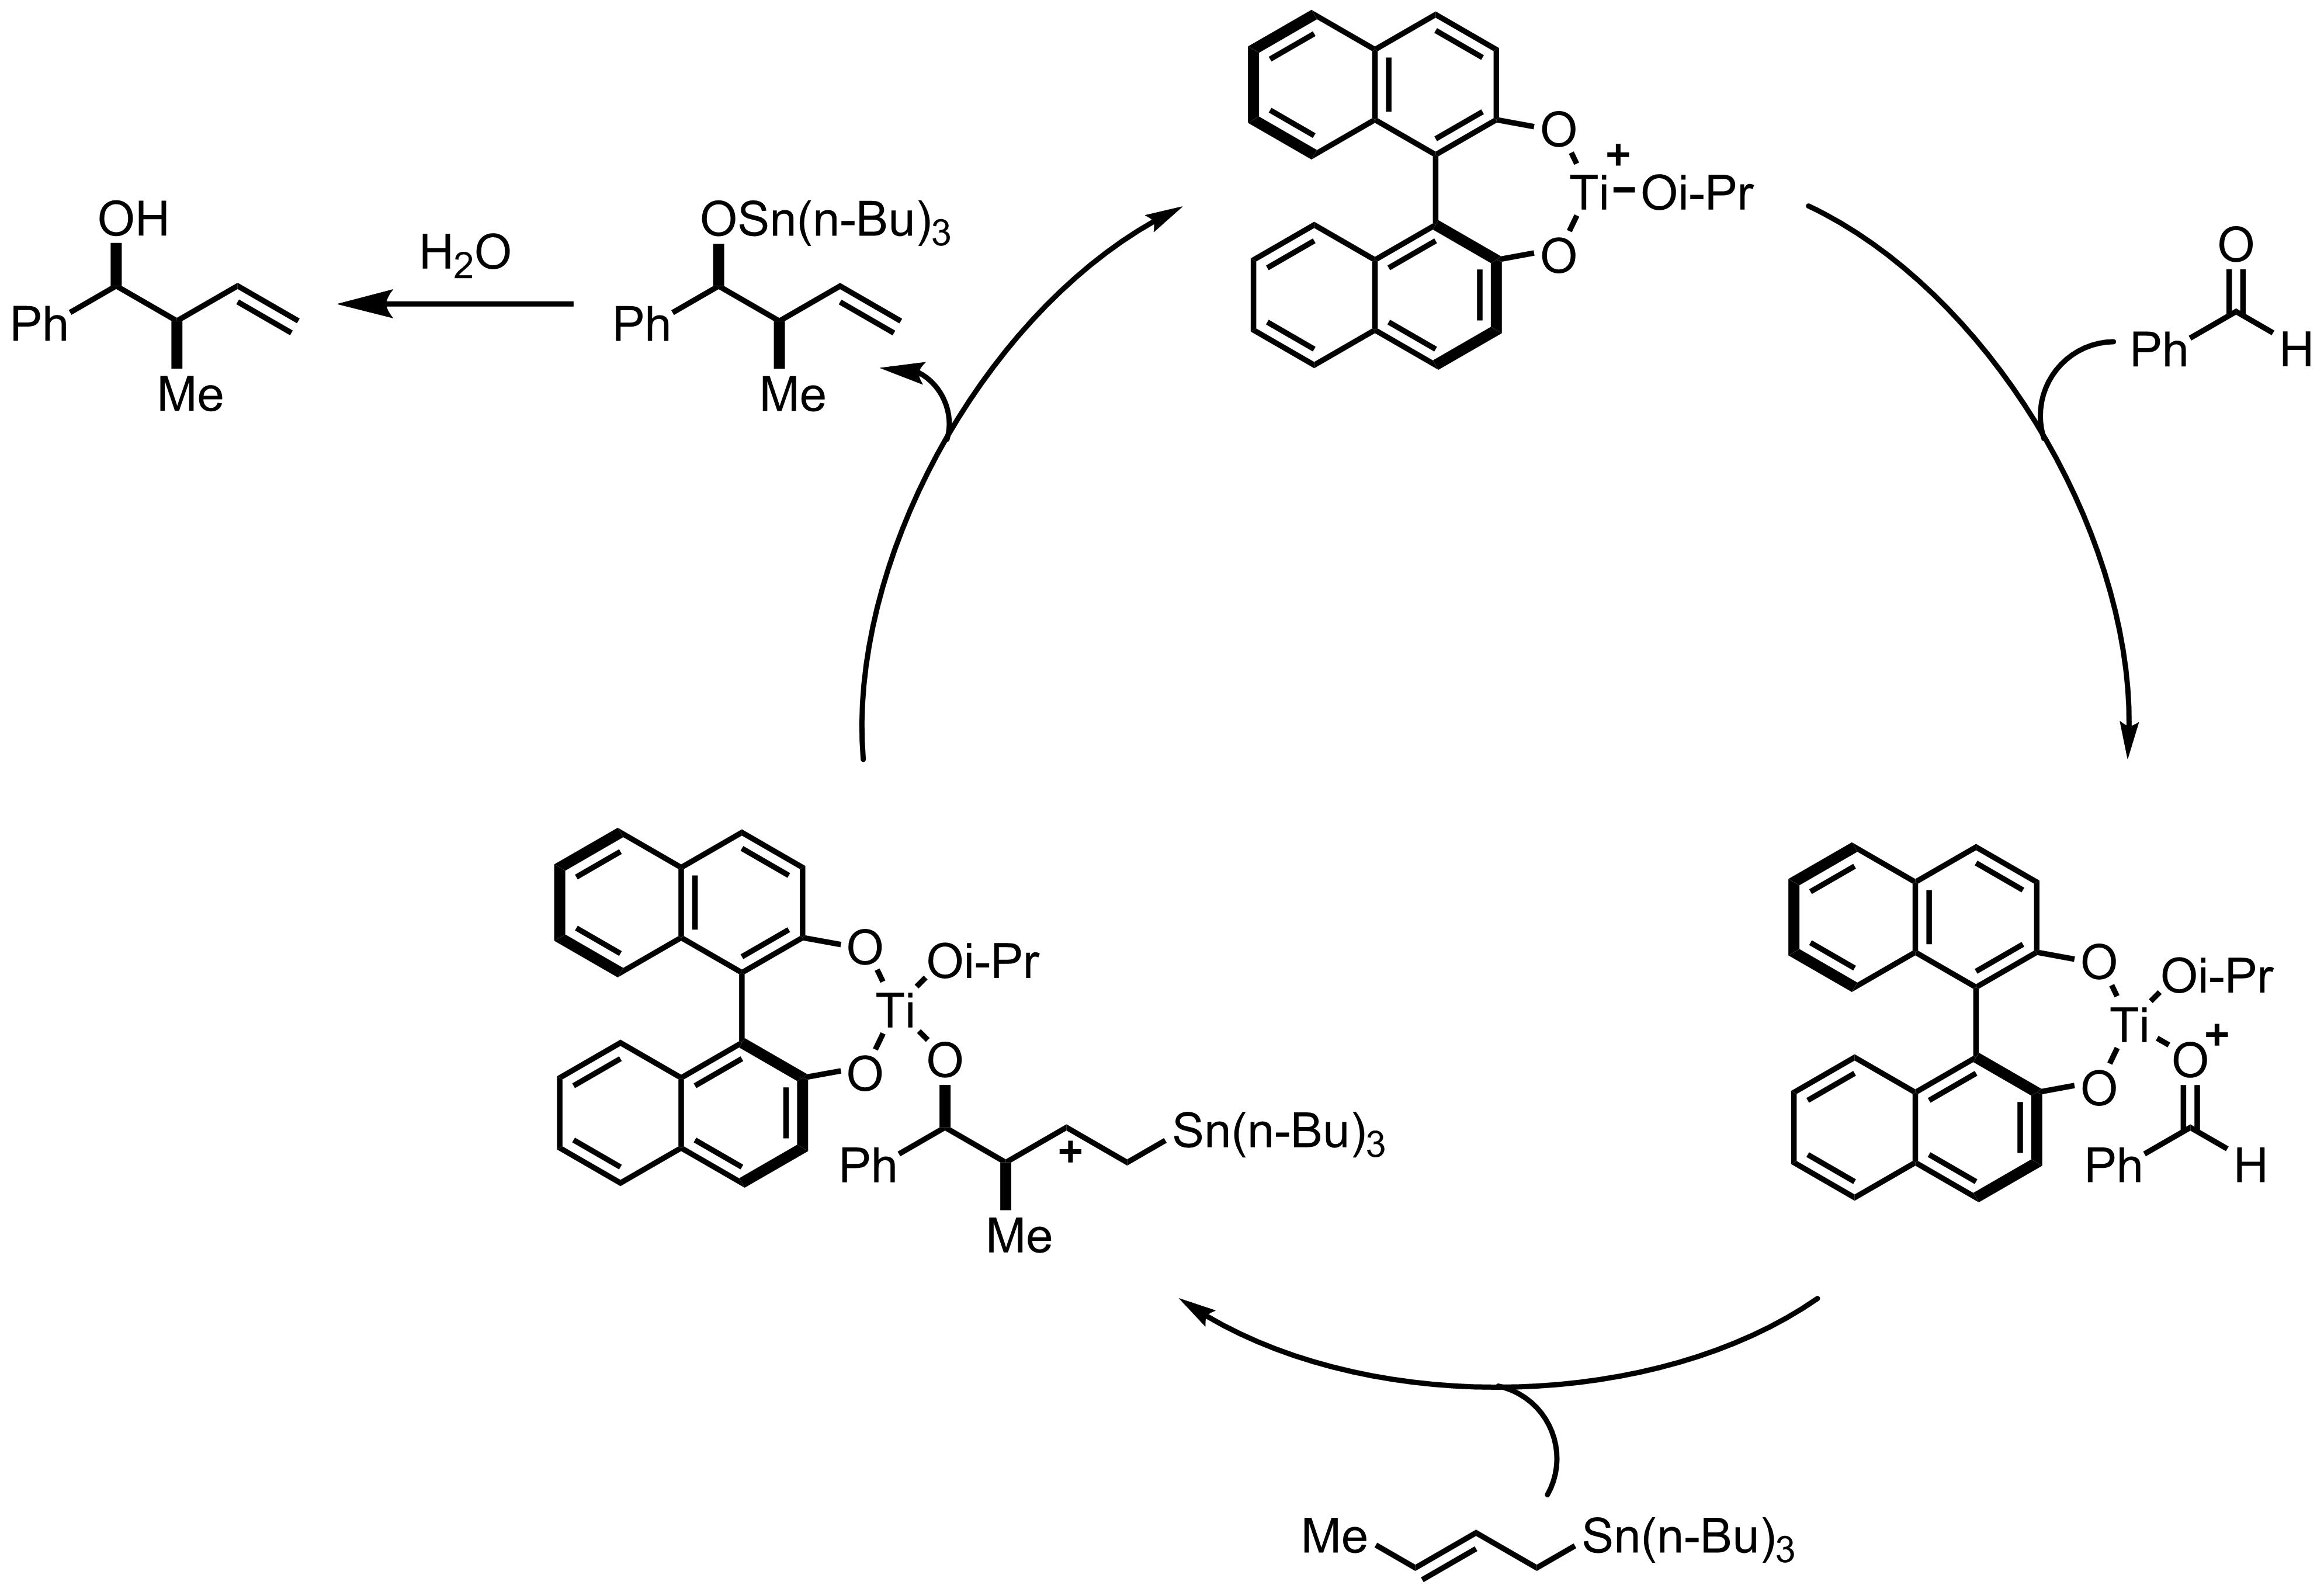 Mechanism of the Keck Asymmetric Allylation